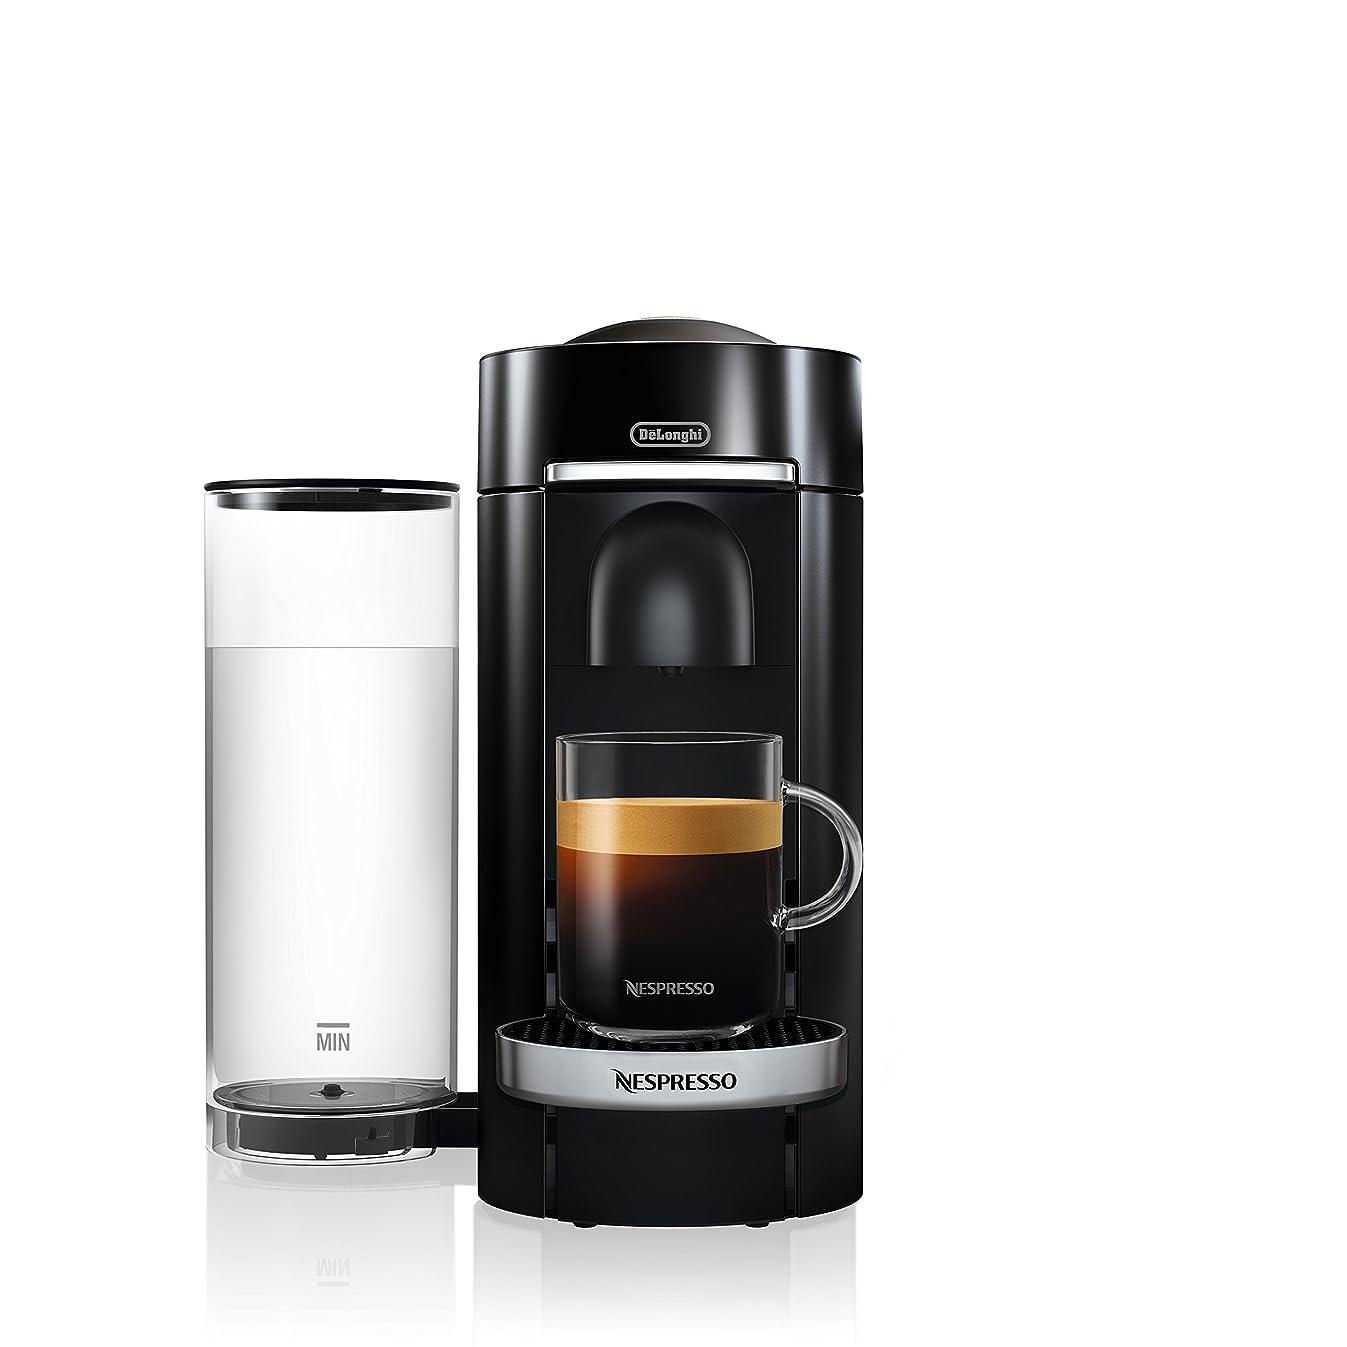 Nespresso ENV155B VertuoPlus Deluxe Coffee and Espresso Maker by De'Longhi, Black